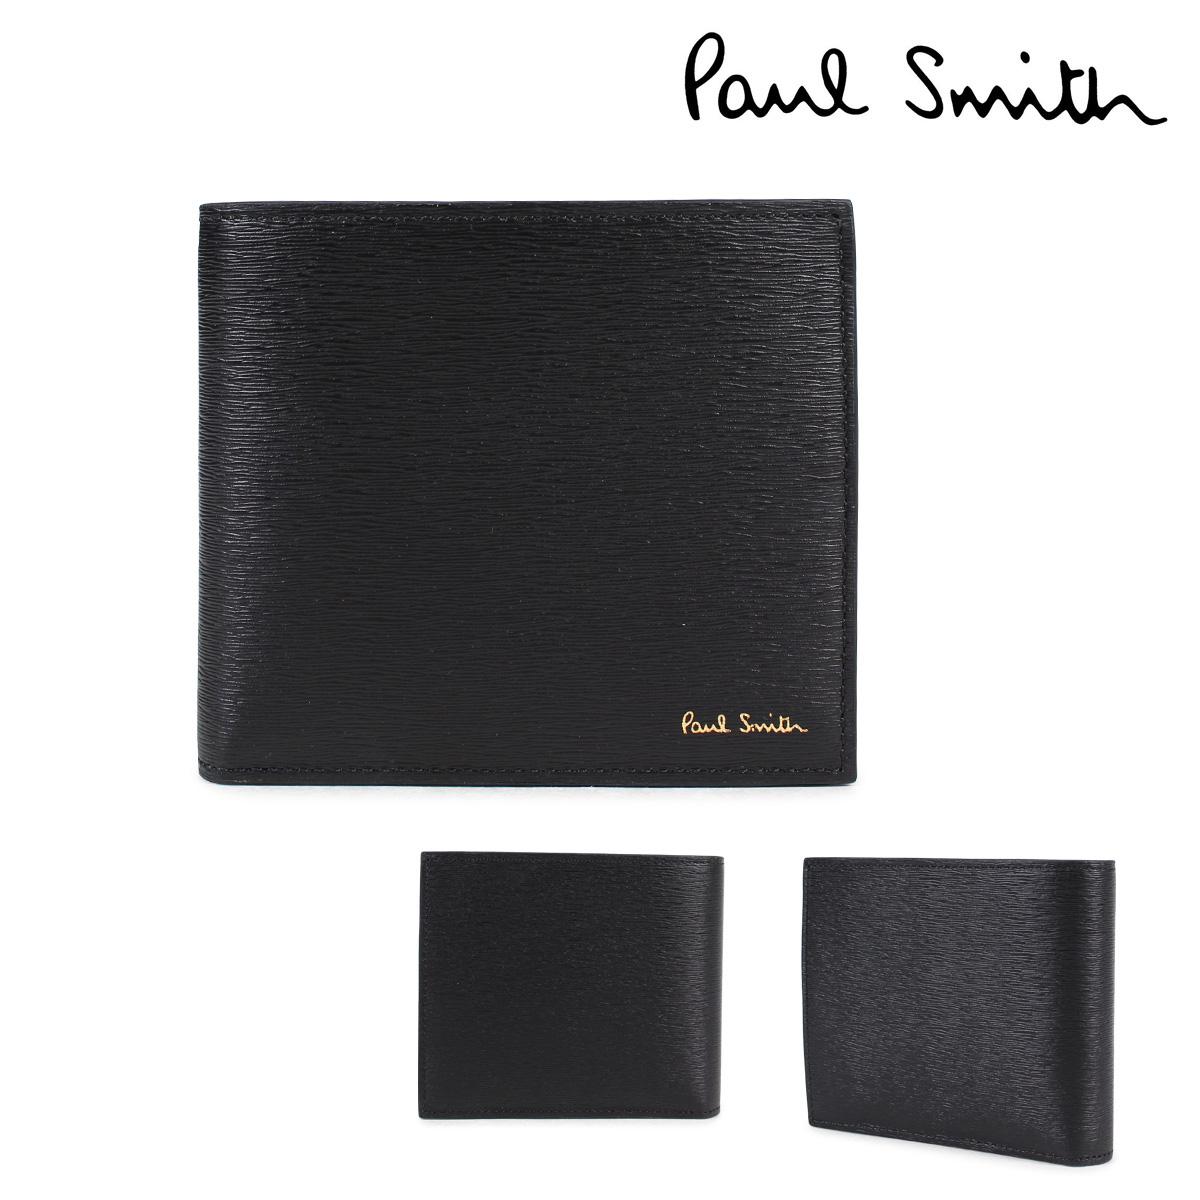 Paul Smith 財布 メンズ 二つ折り ポールスミス SMART WALLET レザー ブラック 4833 W905 79